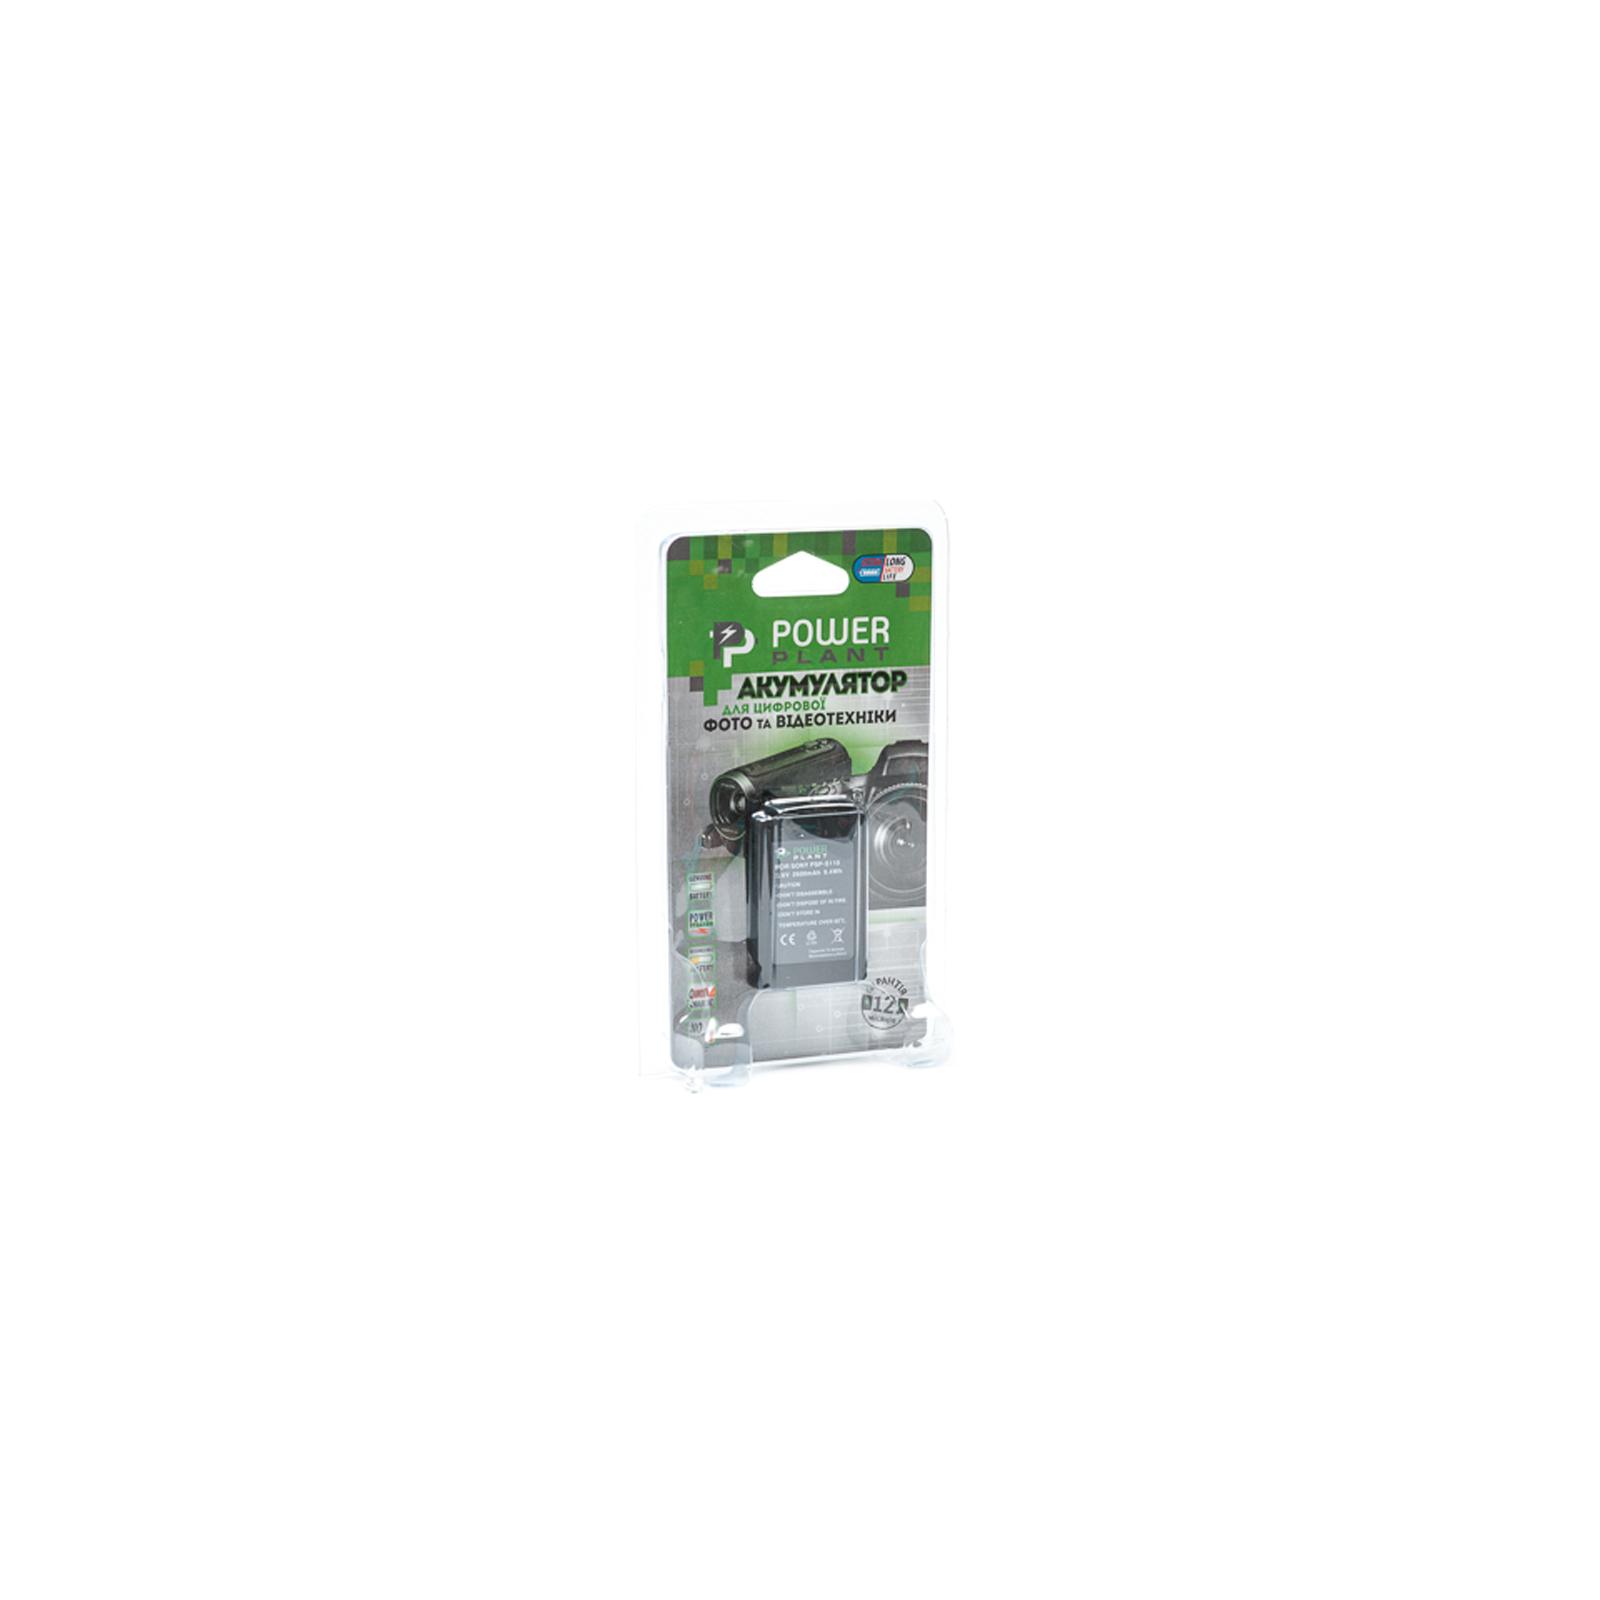 Аккумулятор к фото/видео PowerPlant Sony PSP-S110/2000/2600/S360 (DV00DV1300) изображение 3